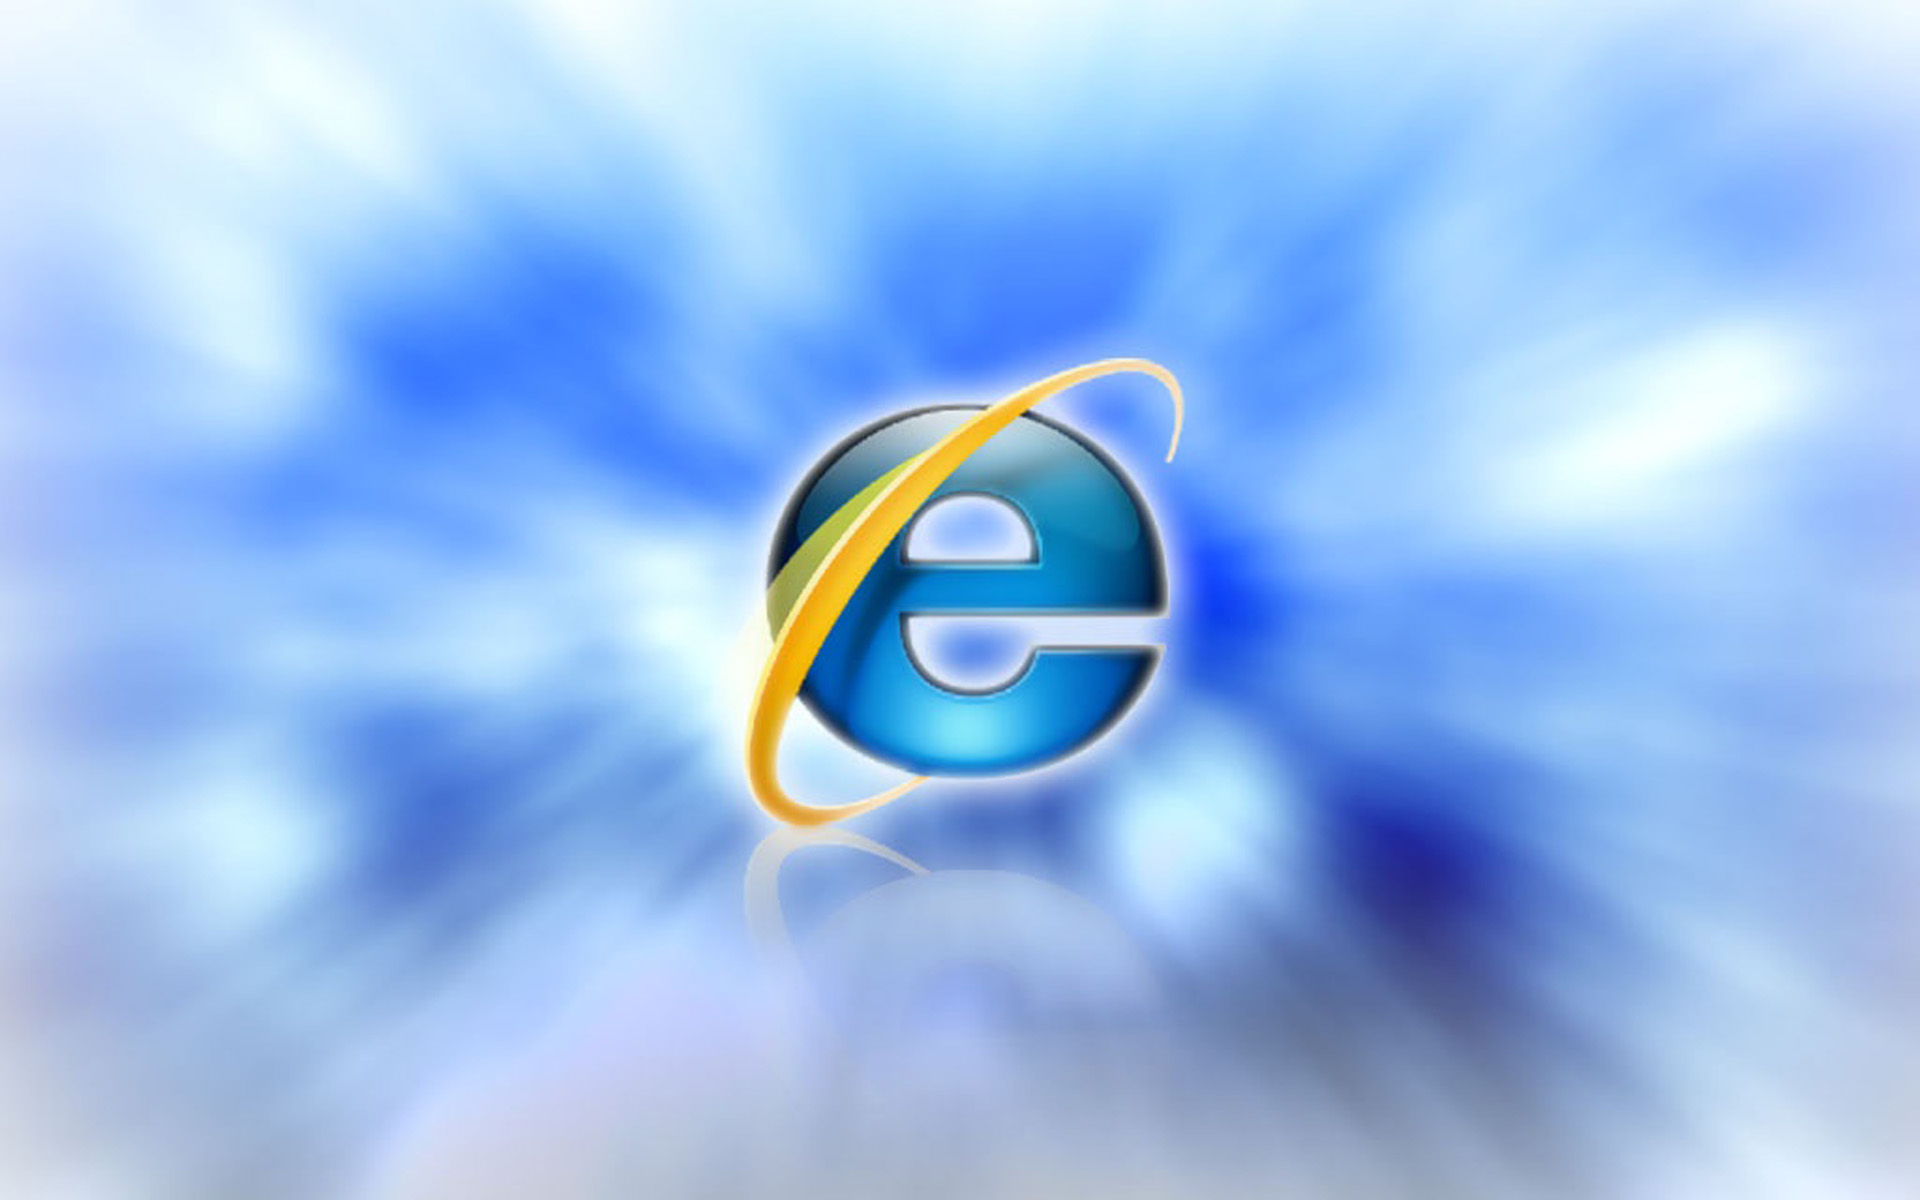 Internet explorer pictures showing red x WindowsXP Tips - Bob Cerelli's Windows Page